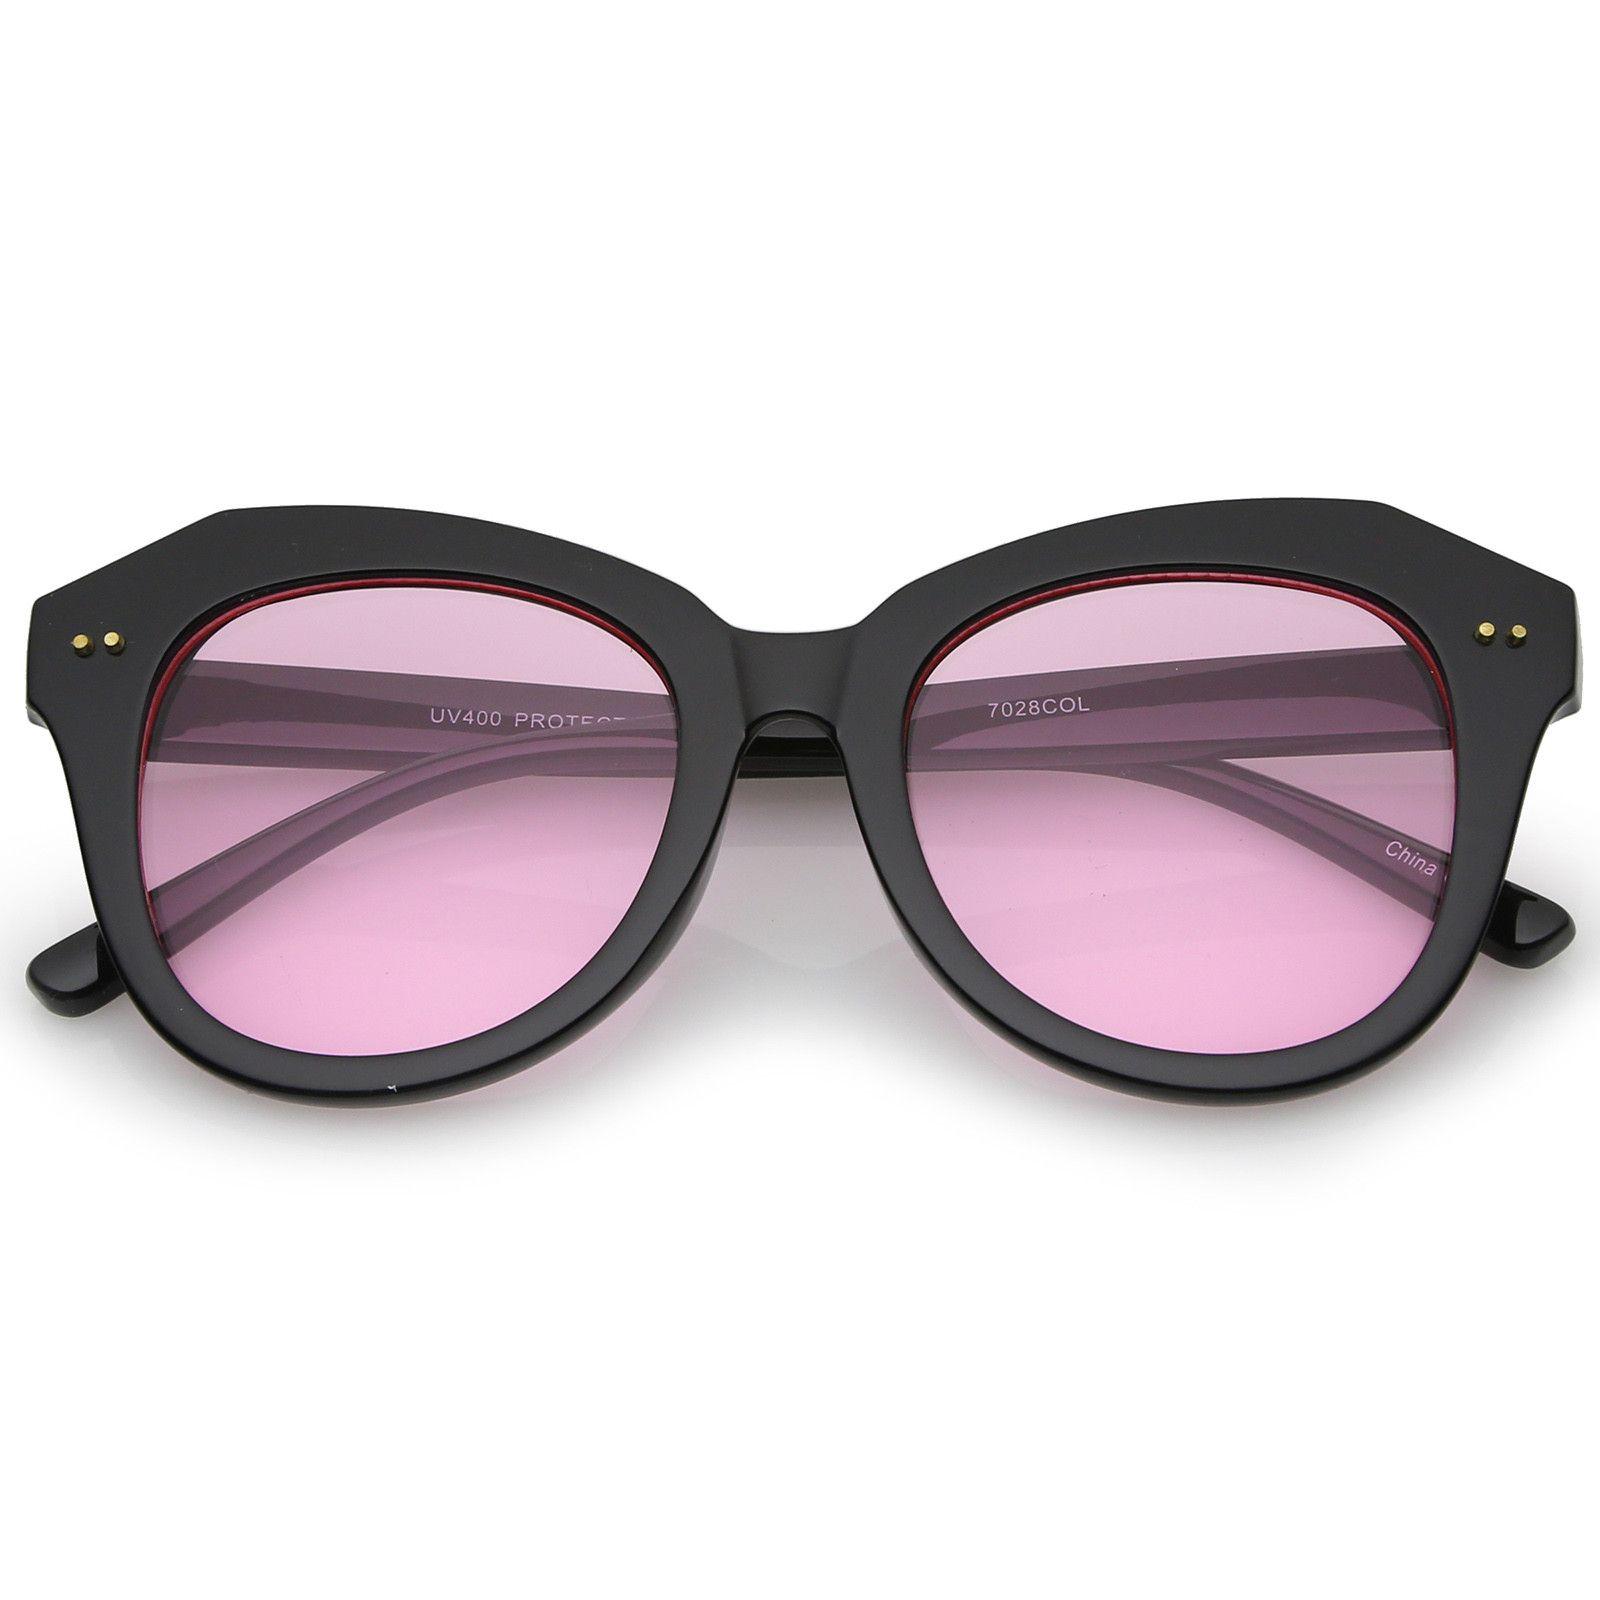 6ab95701beb Women s Oversize Horn Rimmed Colored Round Lens Cat Eye Sunglasses 52mm   sunglass  bold  sunglasses  frame  oversized  mirrored  summer  cateye   purple   ...